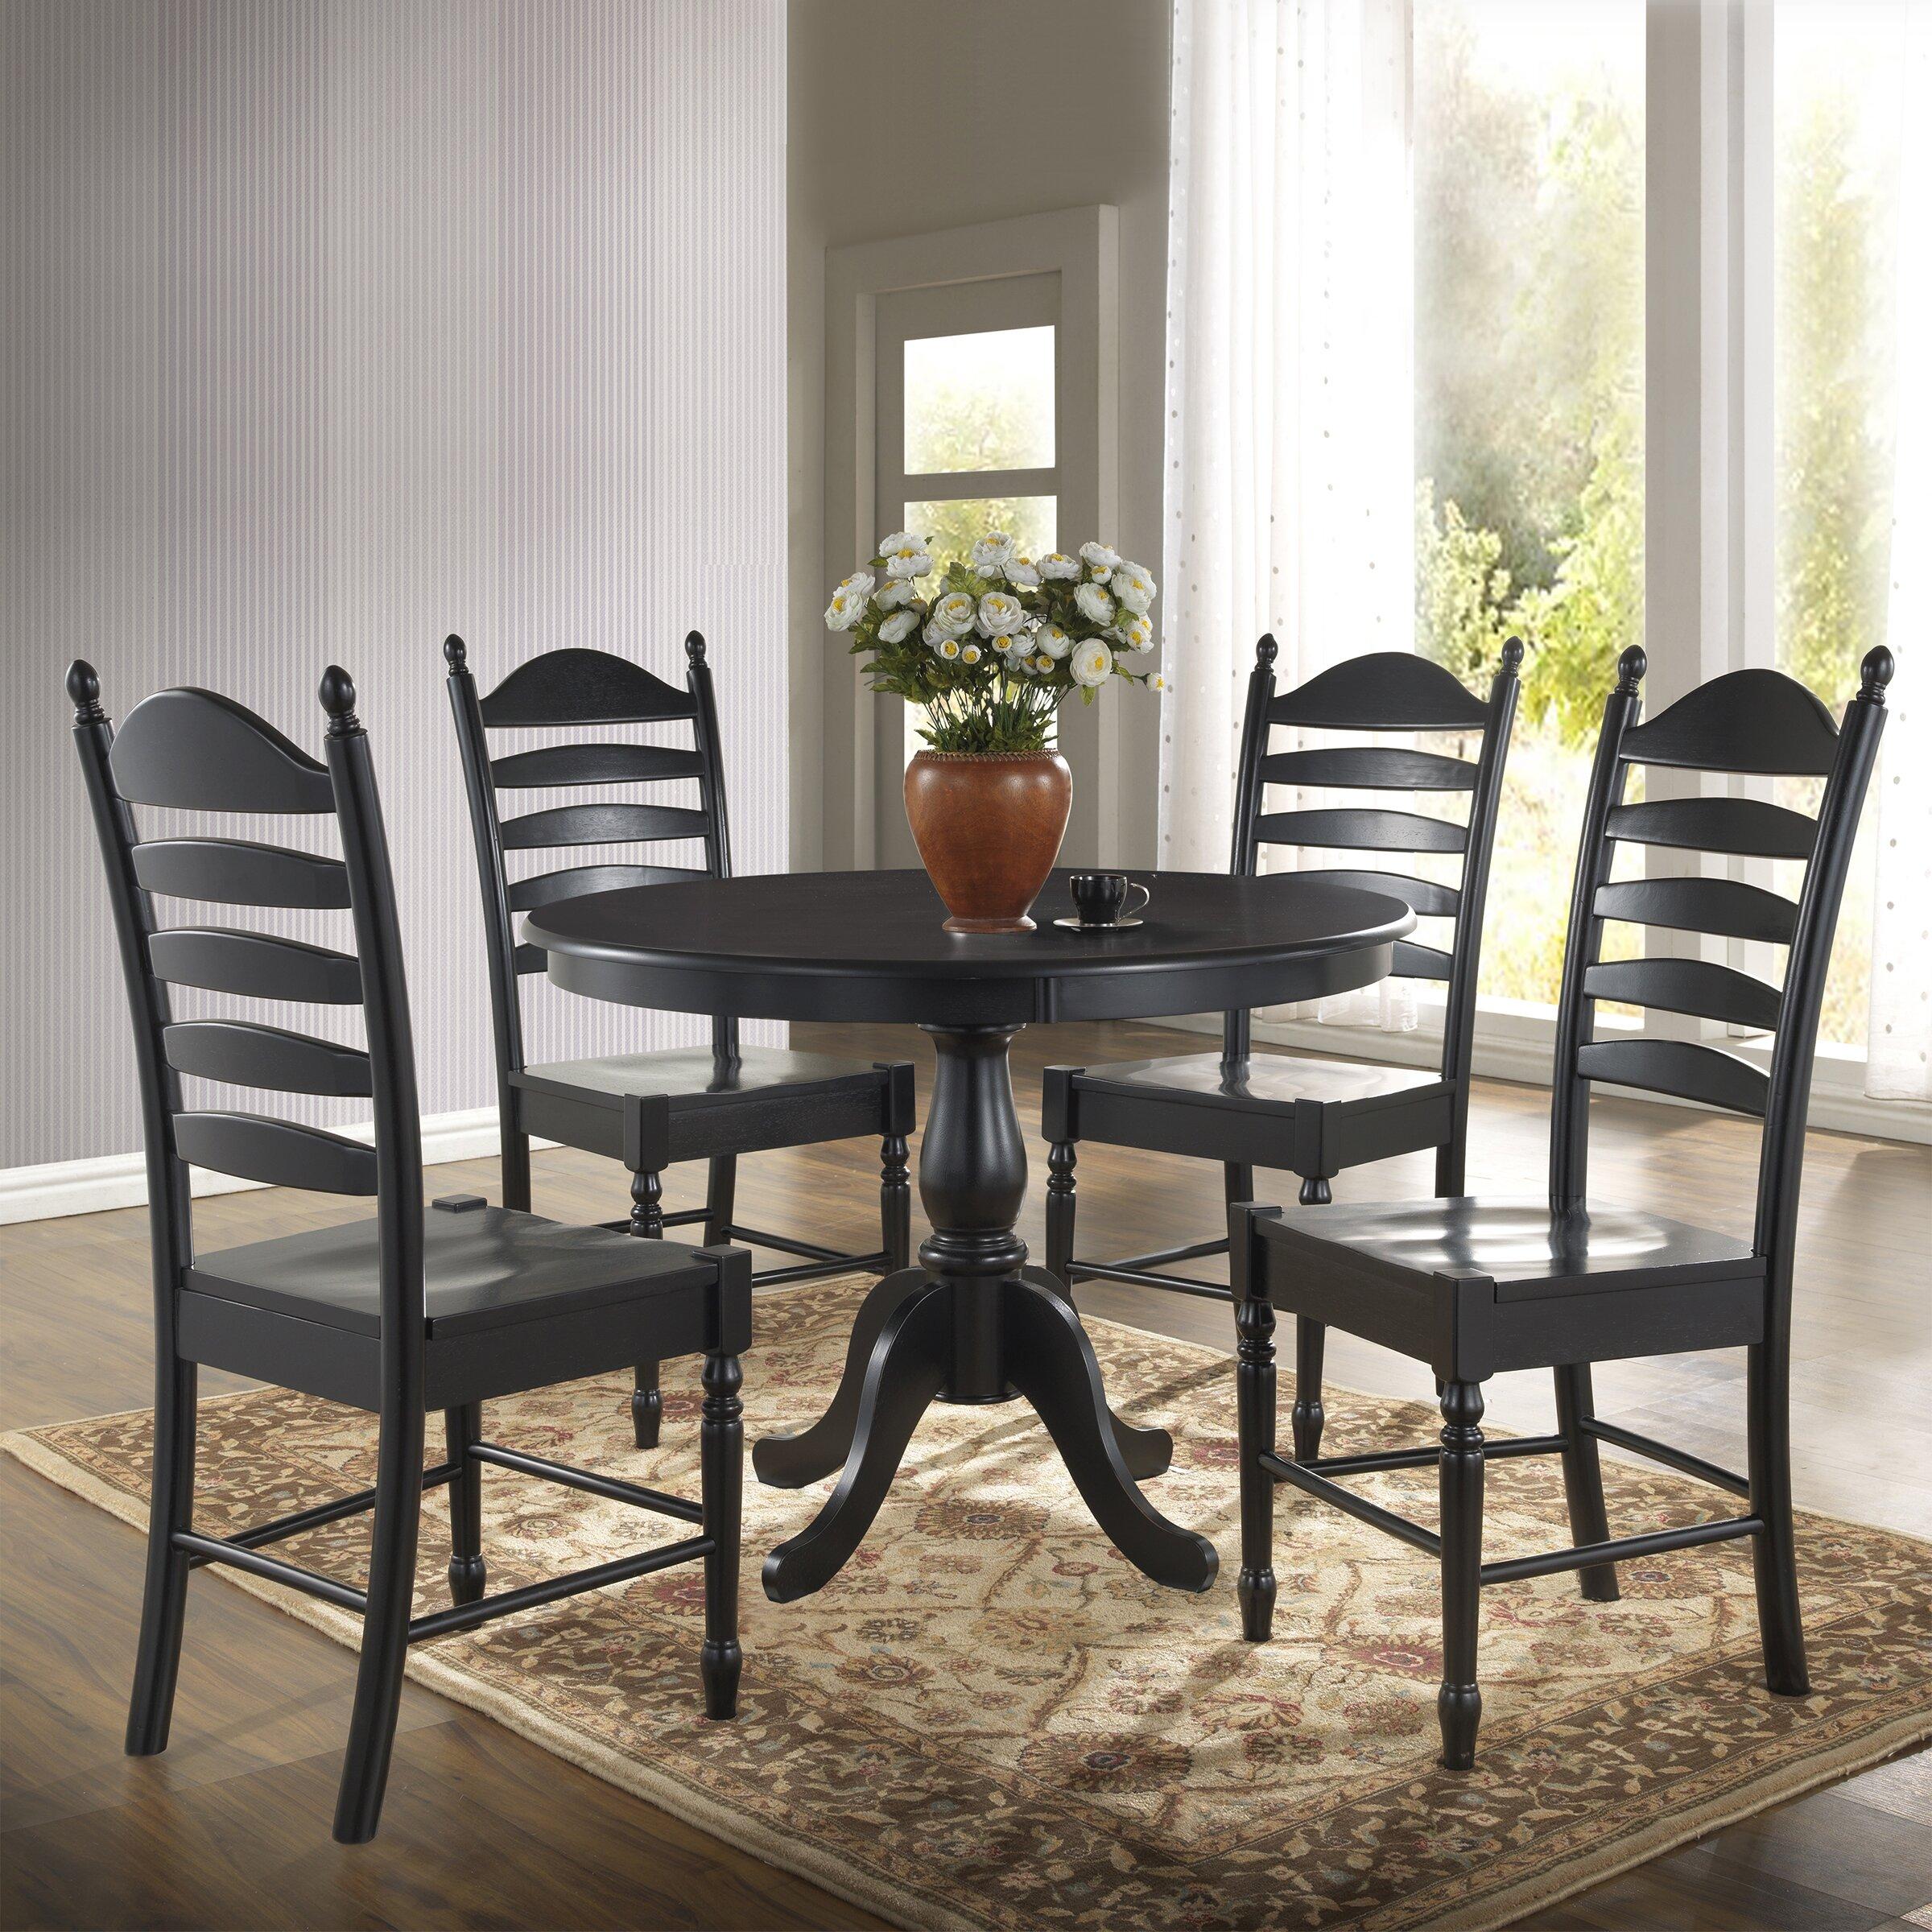 carolina cottage newport dining table reviews wayfair. Black Bedroom Furniture Sets. Home Design Ideas